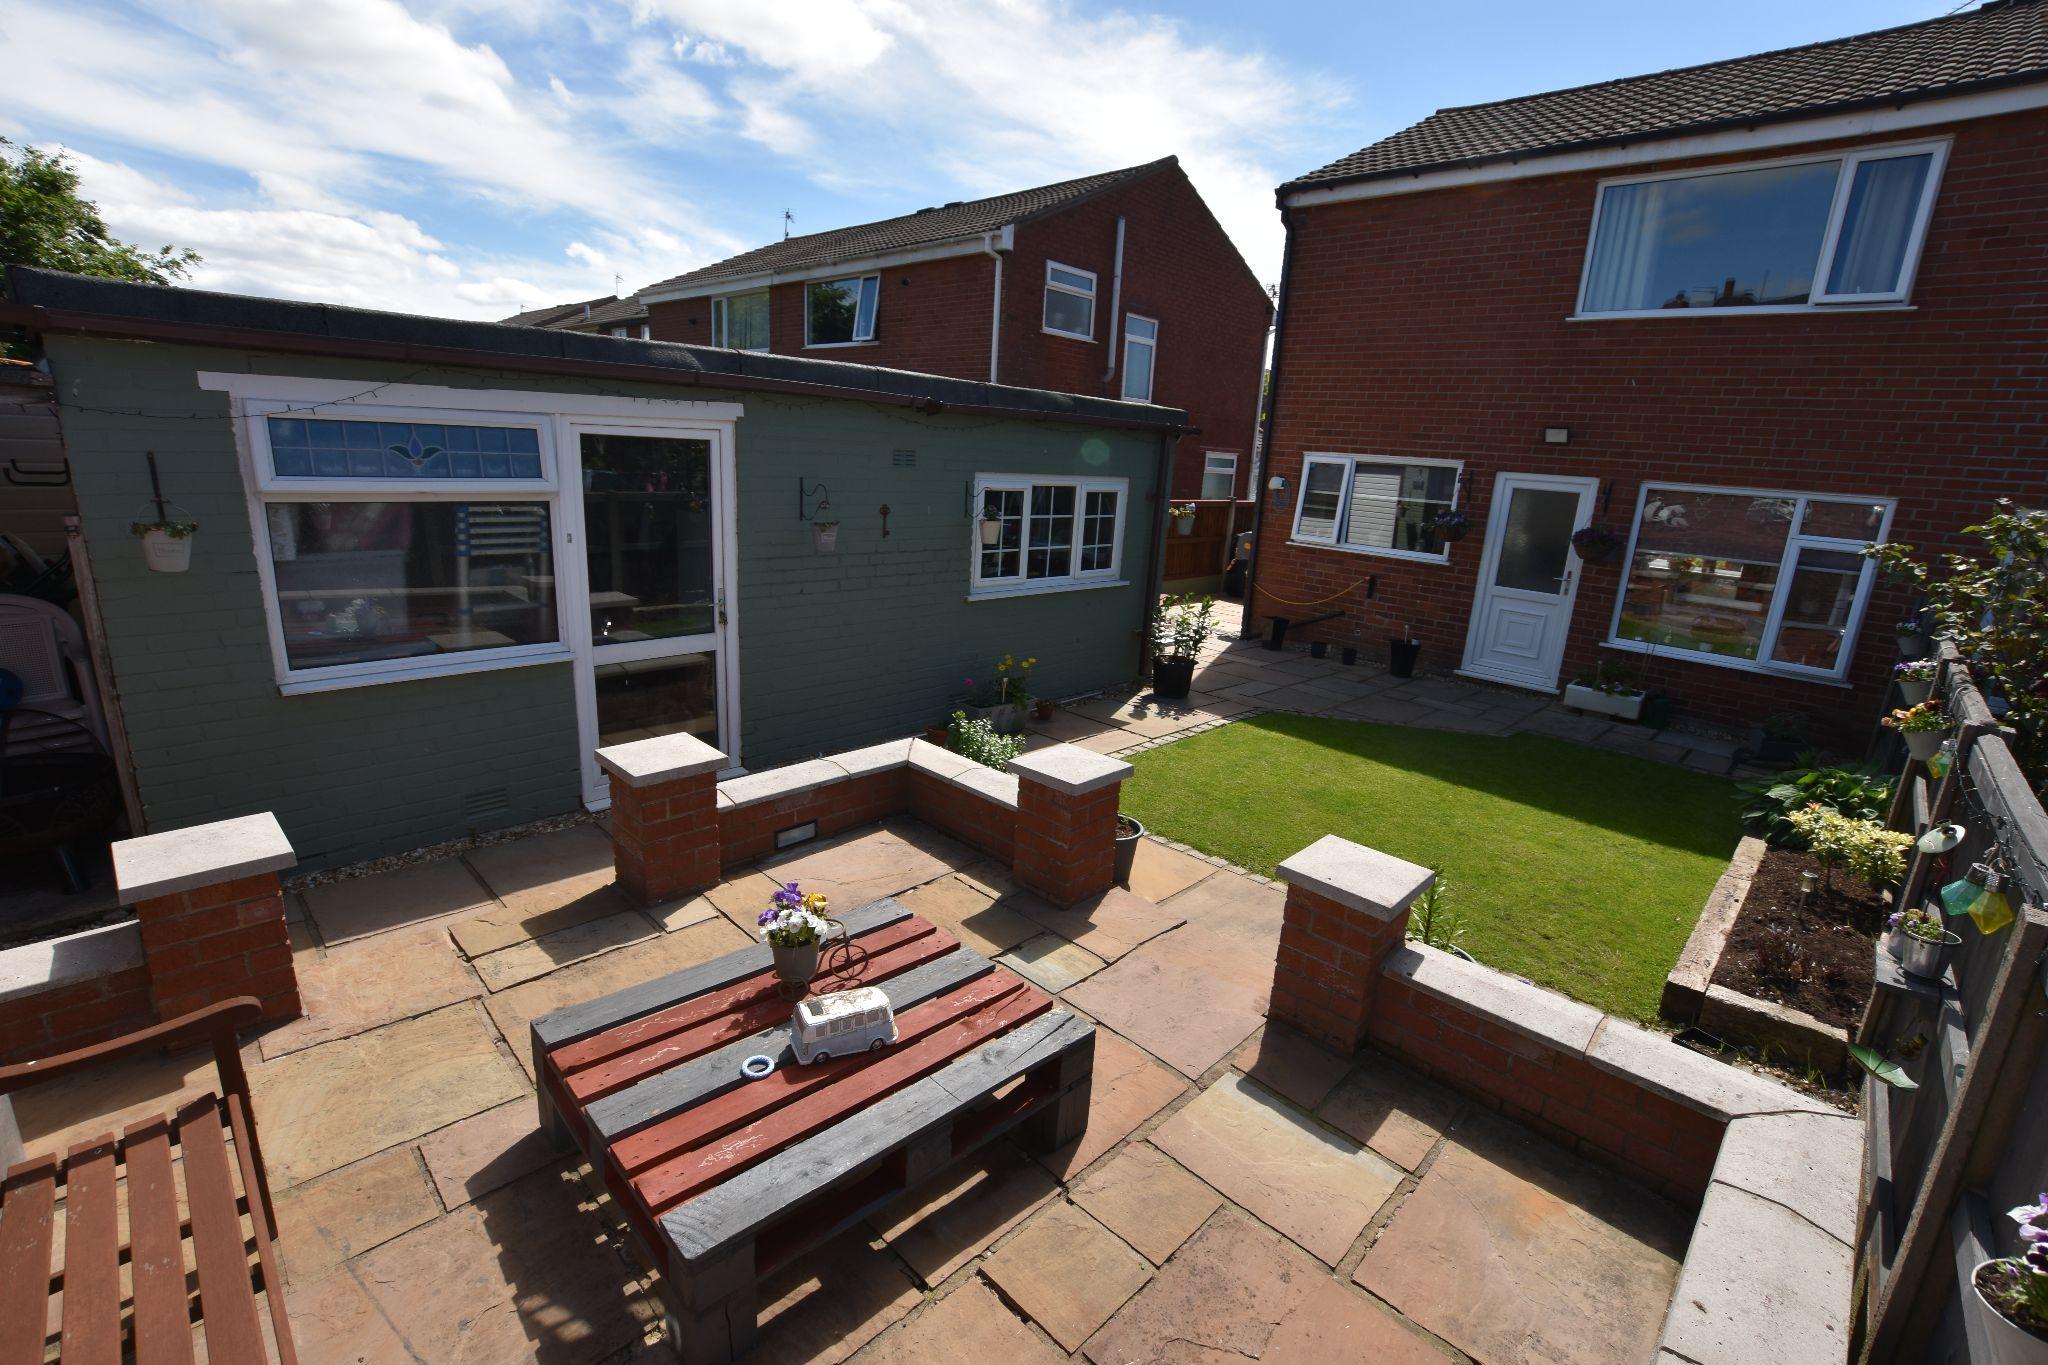 3 bedroom semi-detached house Sold STC in Preston - Rear Garden